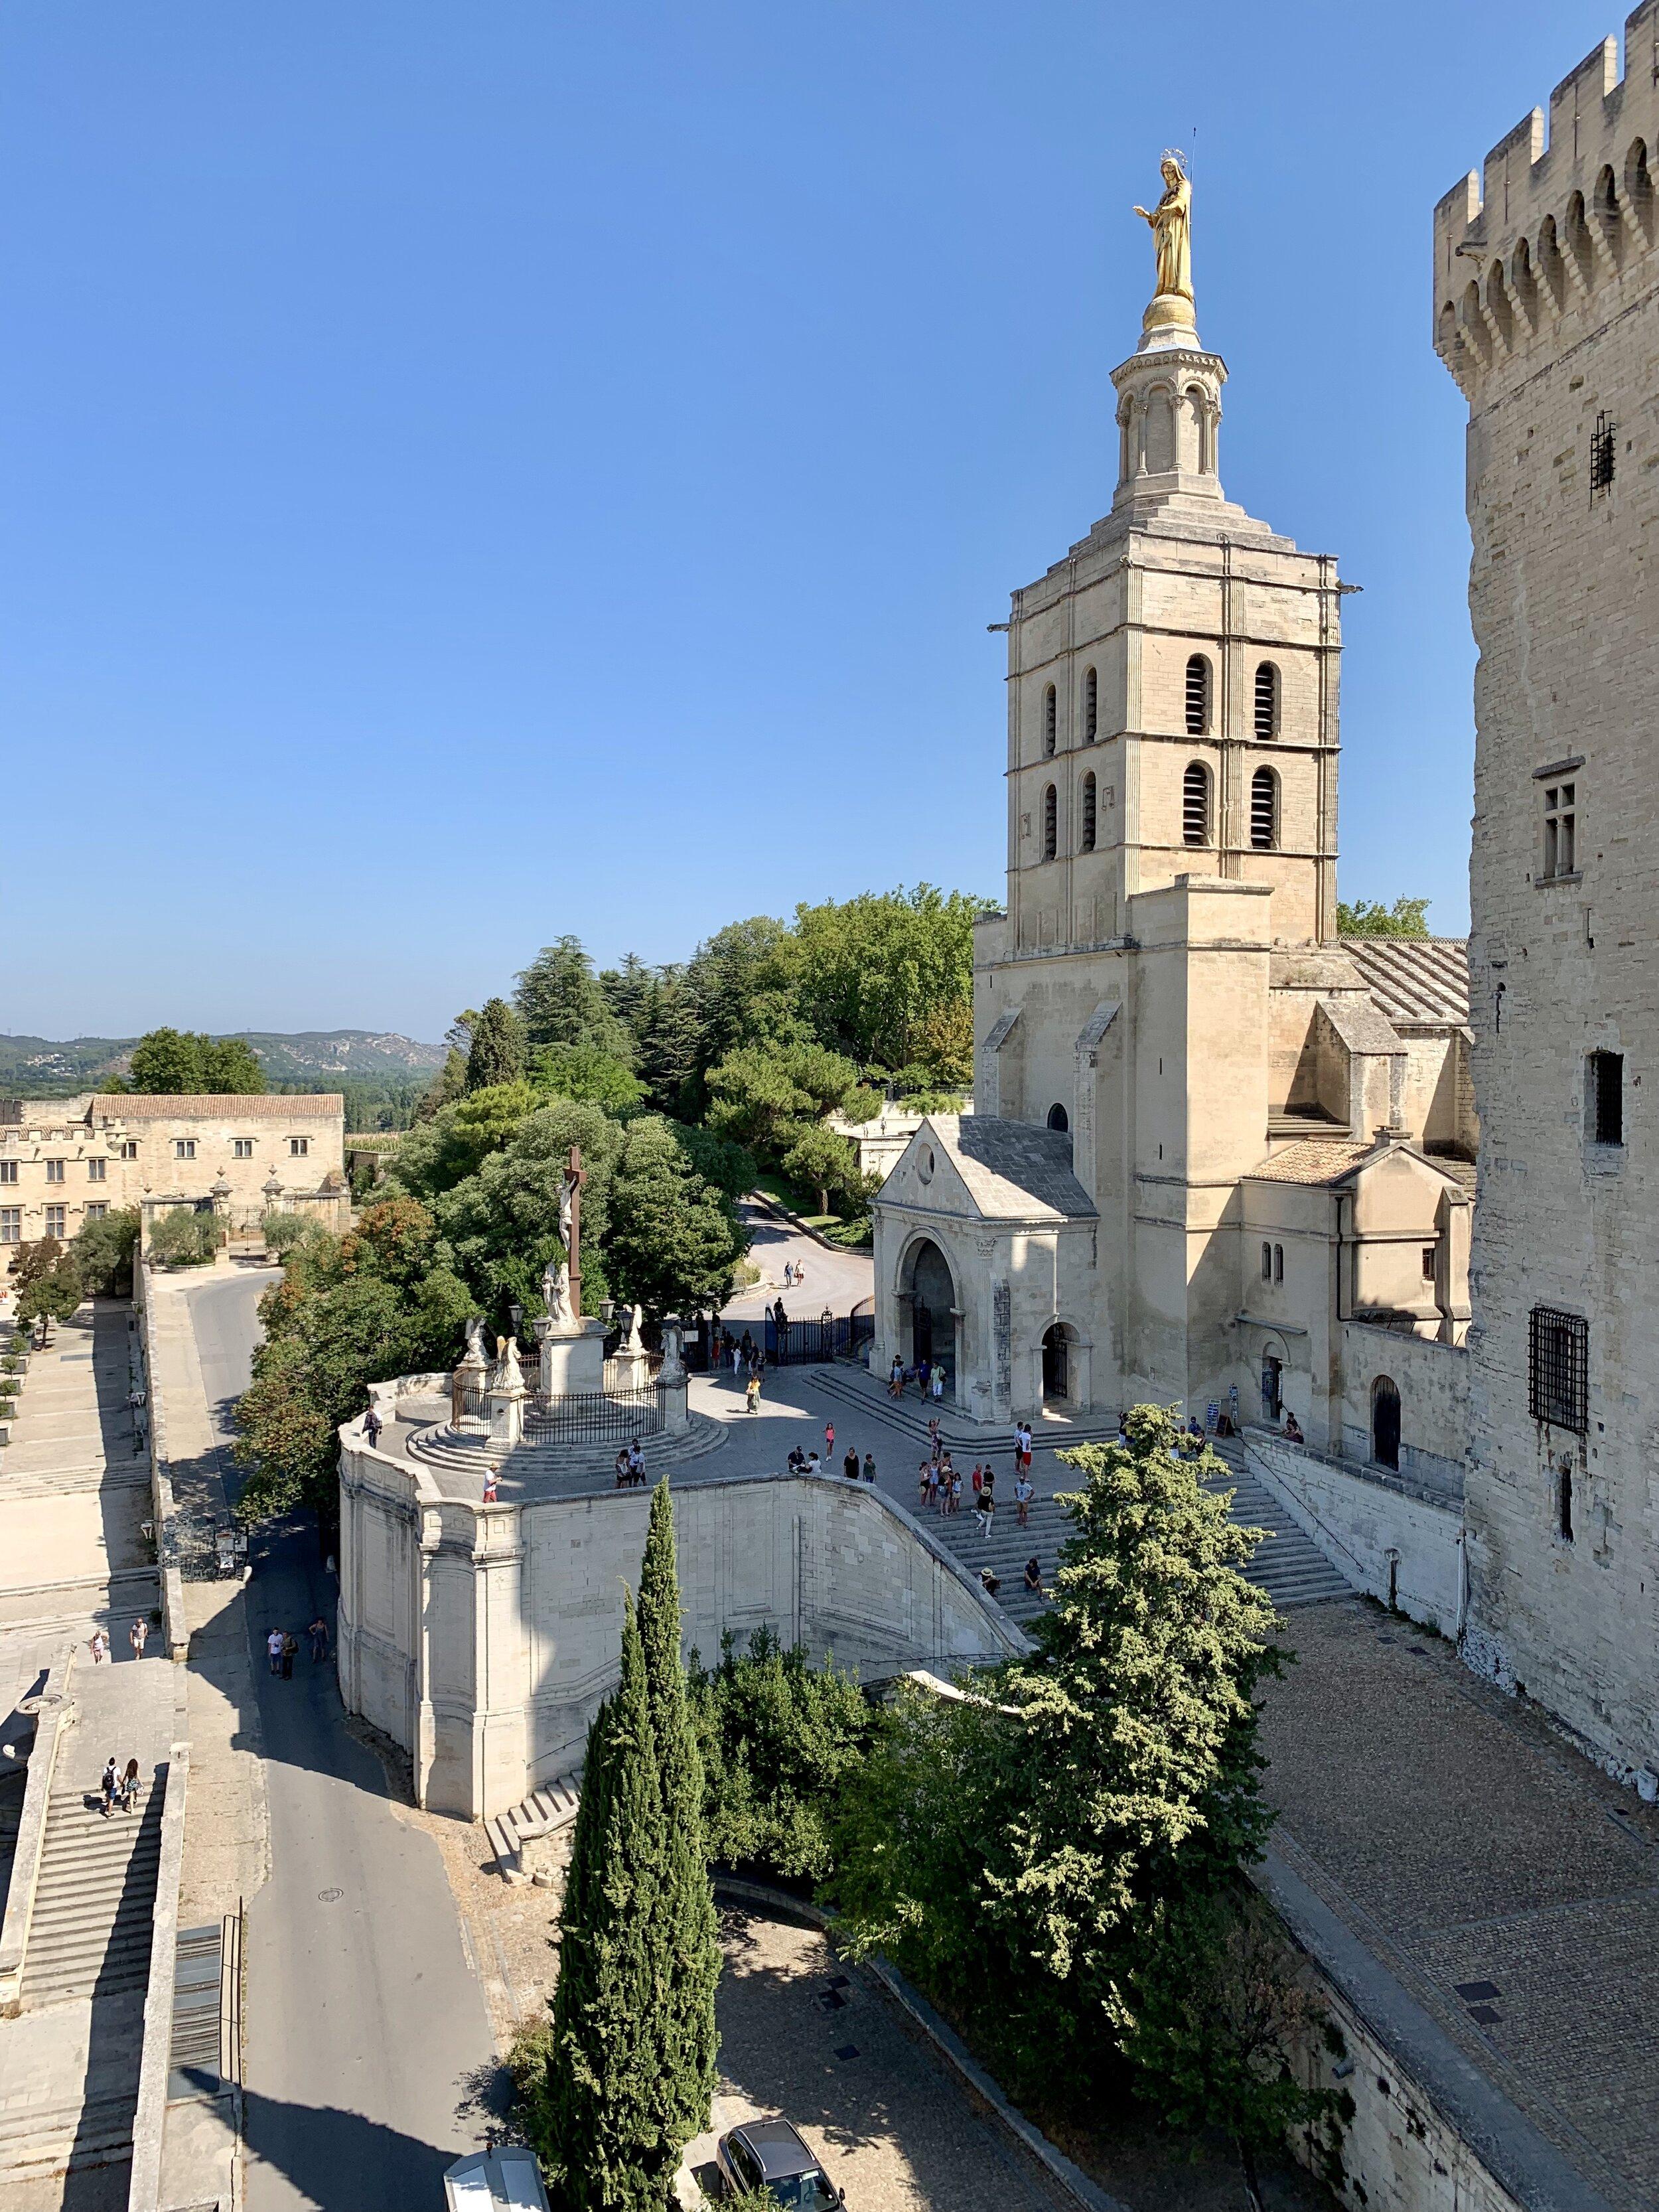 The Palais des Papes in Avignon, France. August 24, 2019.